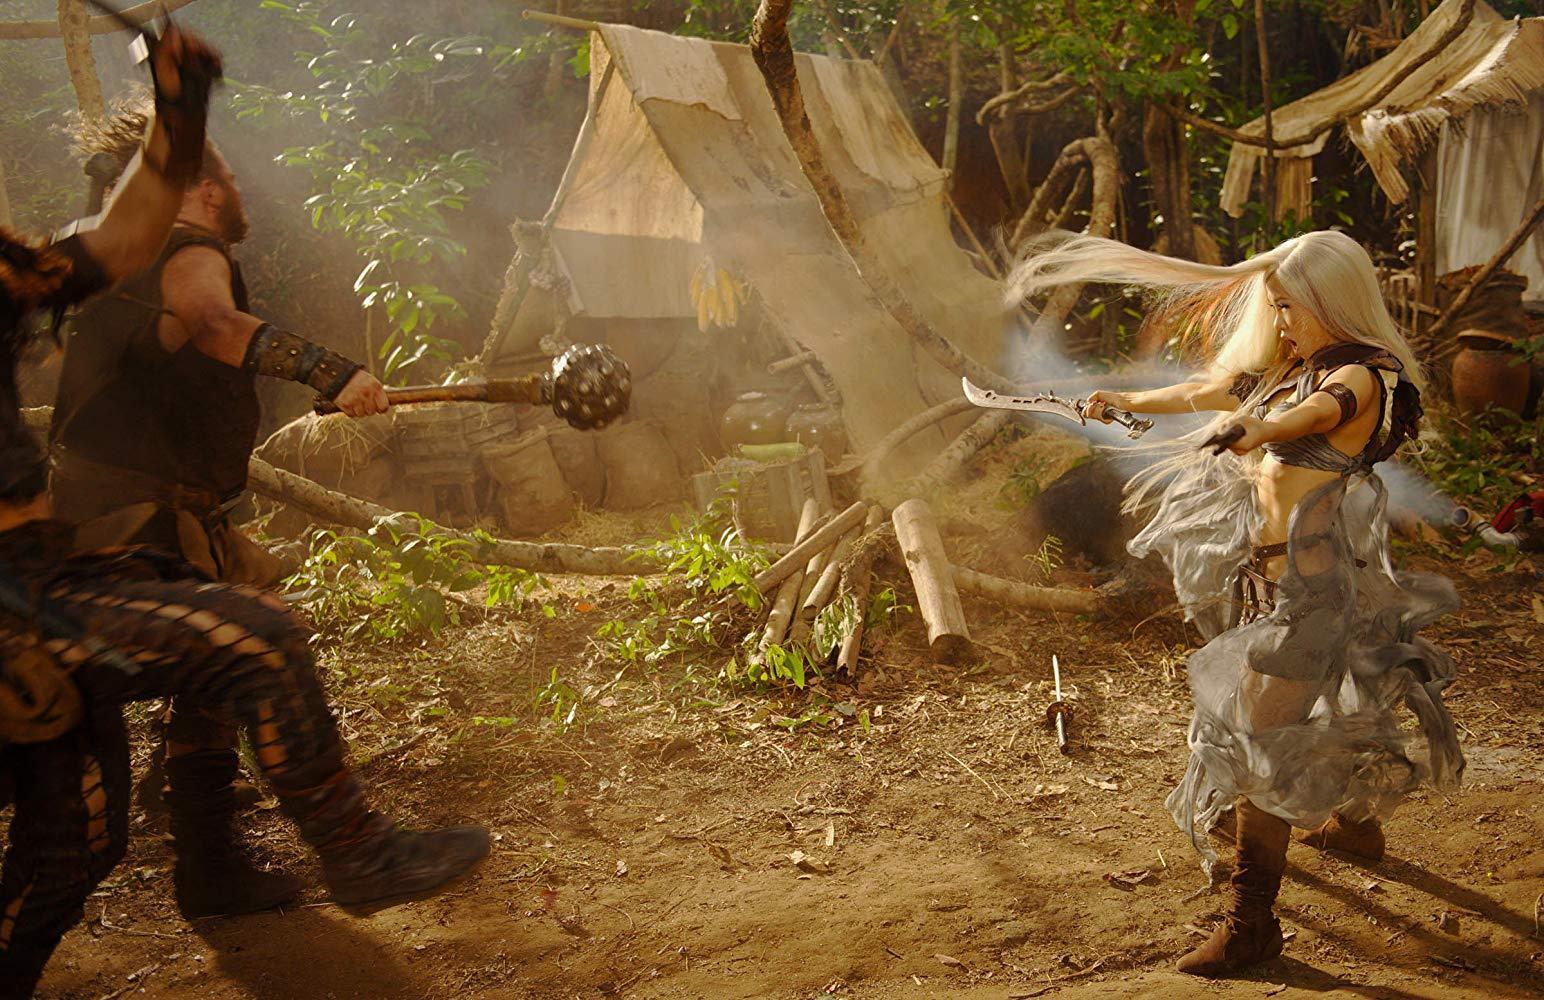 مشاهدة فيلم The Scorpion King 3 Battle For Redemption 2012 HD مترجم كامل اون لاين